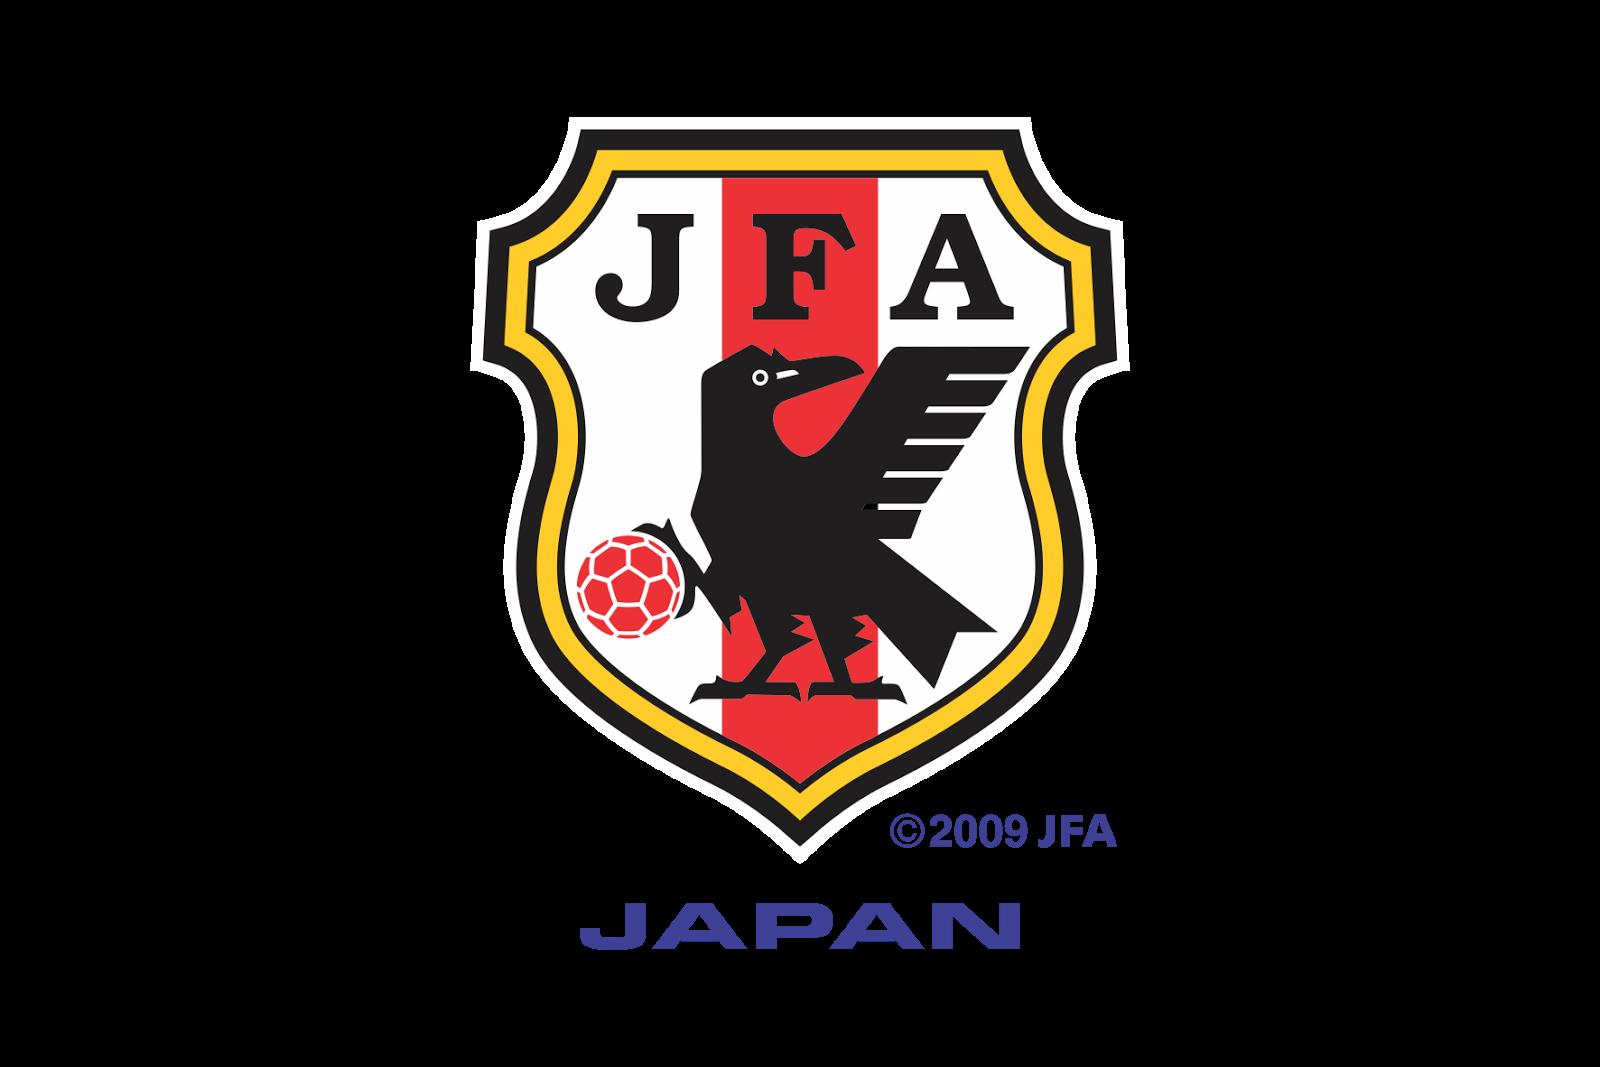 Japan Football Team Logos